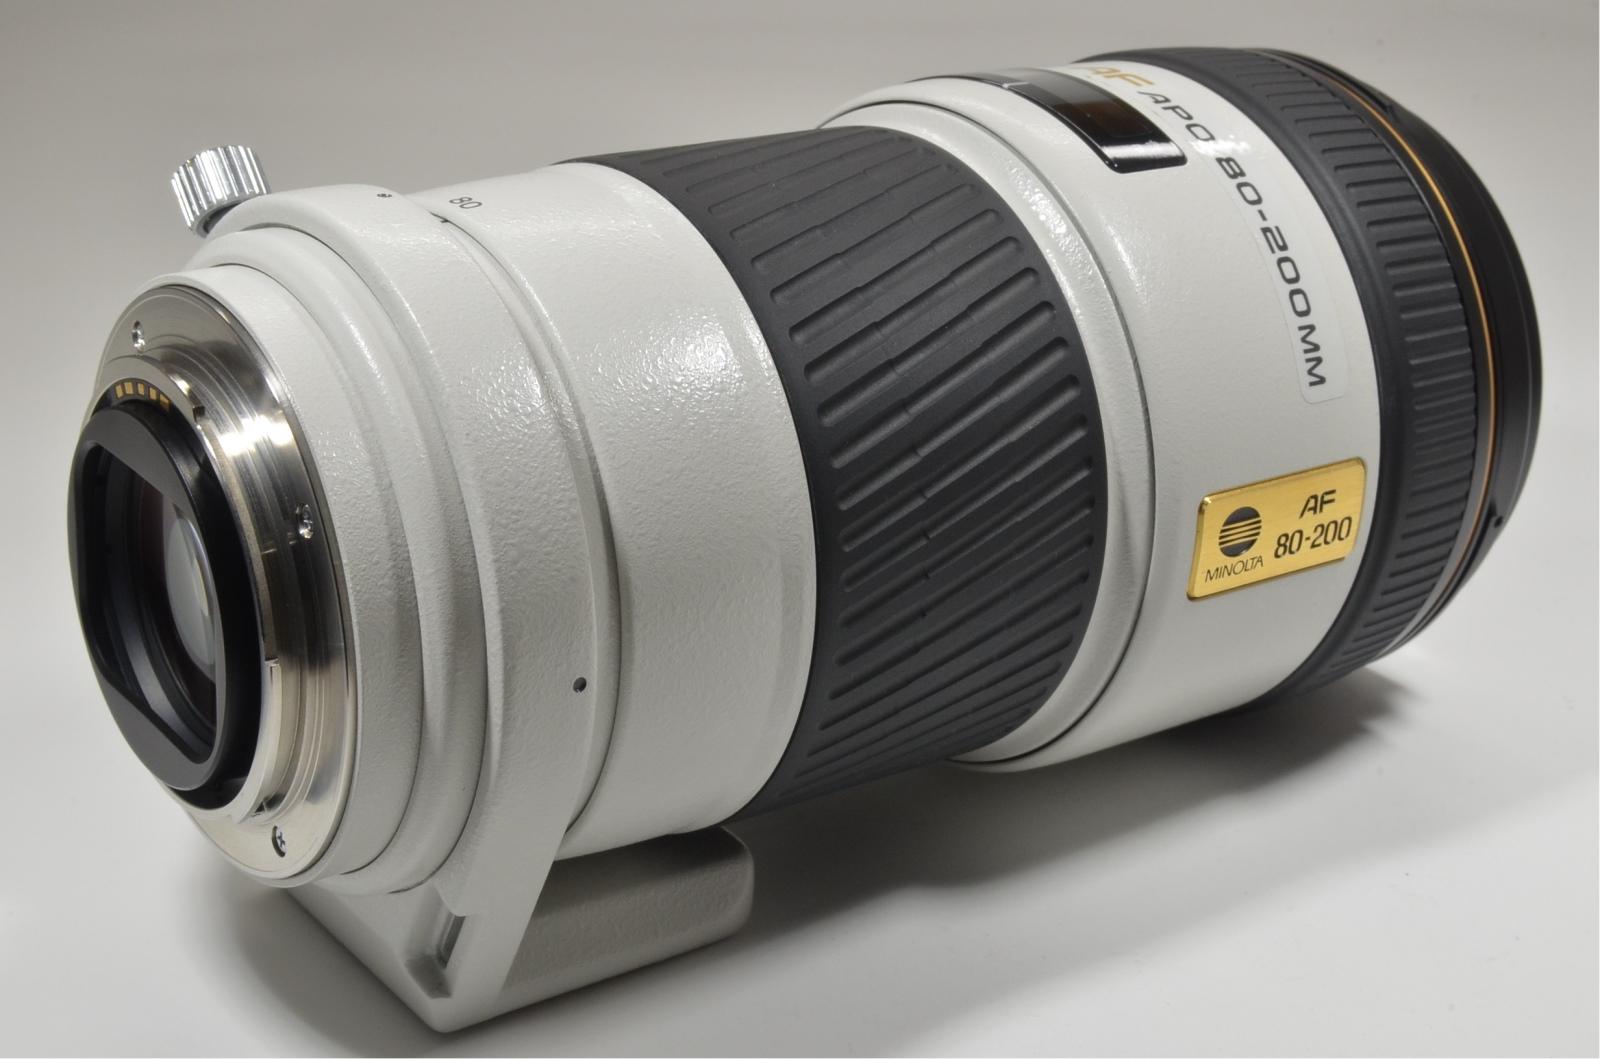 minolta high speed af apo 80-200mm f2.8 g lens sony japan